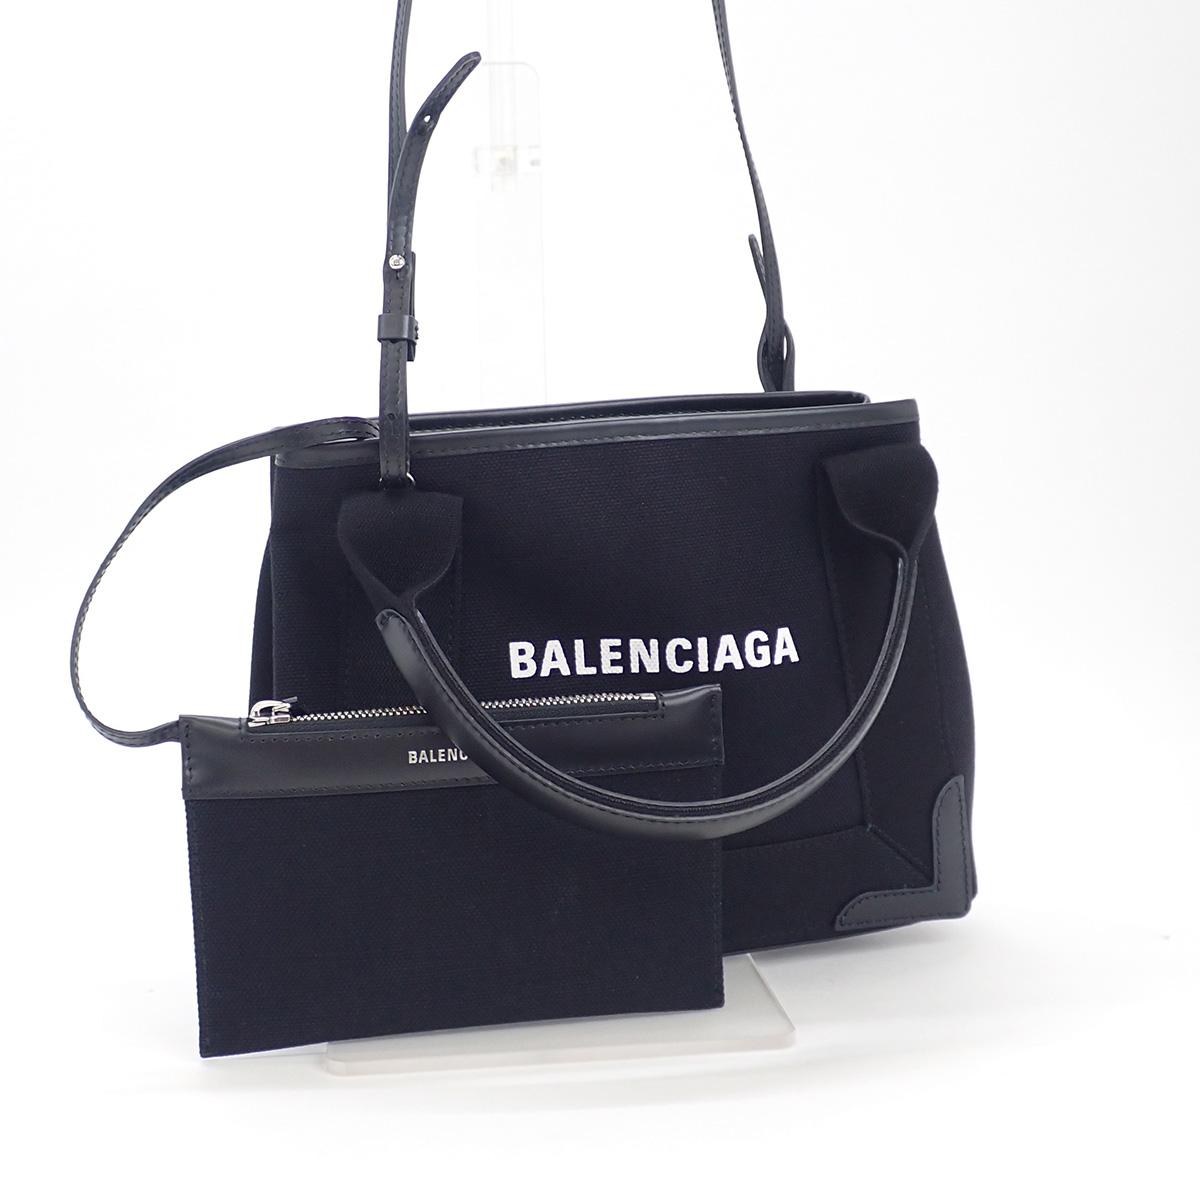 BALENCIAGA バレンシアガ ネイビーカバ XS 2WAYバッグ 390346 AQ38N 1000 キャンバス ブラック